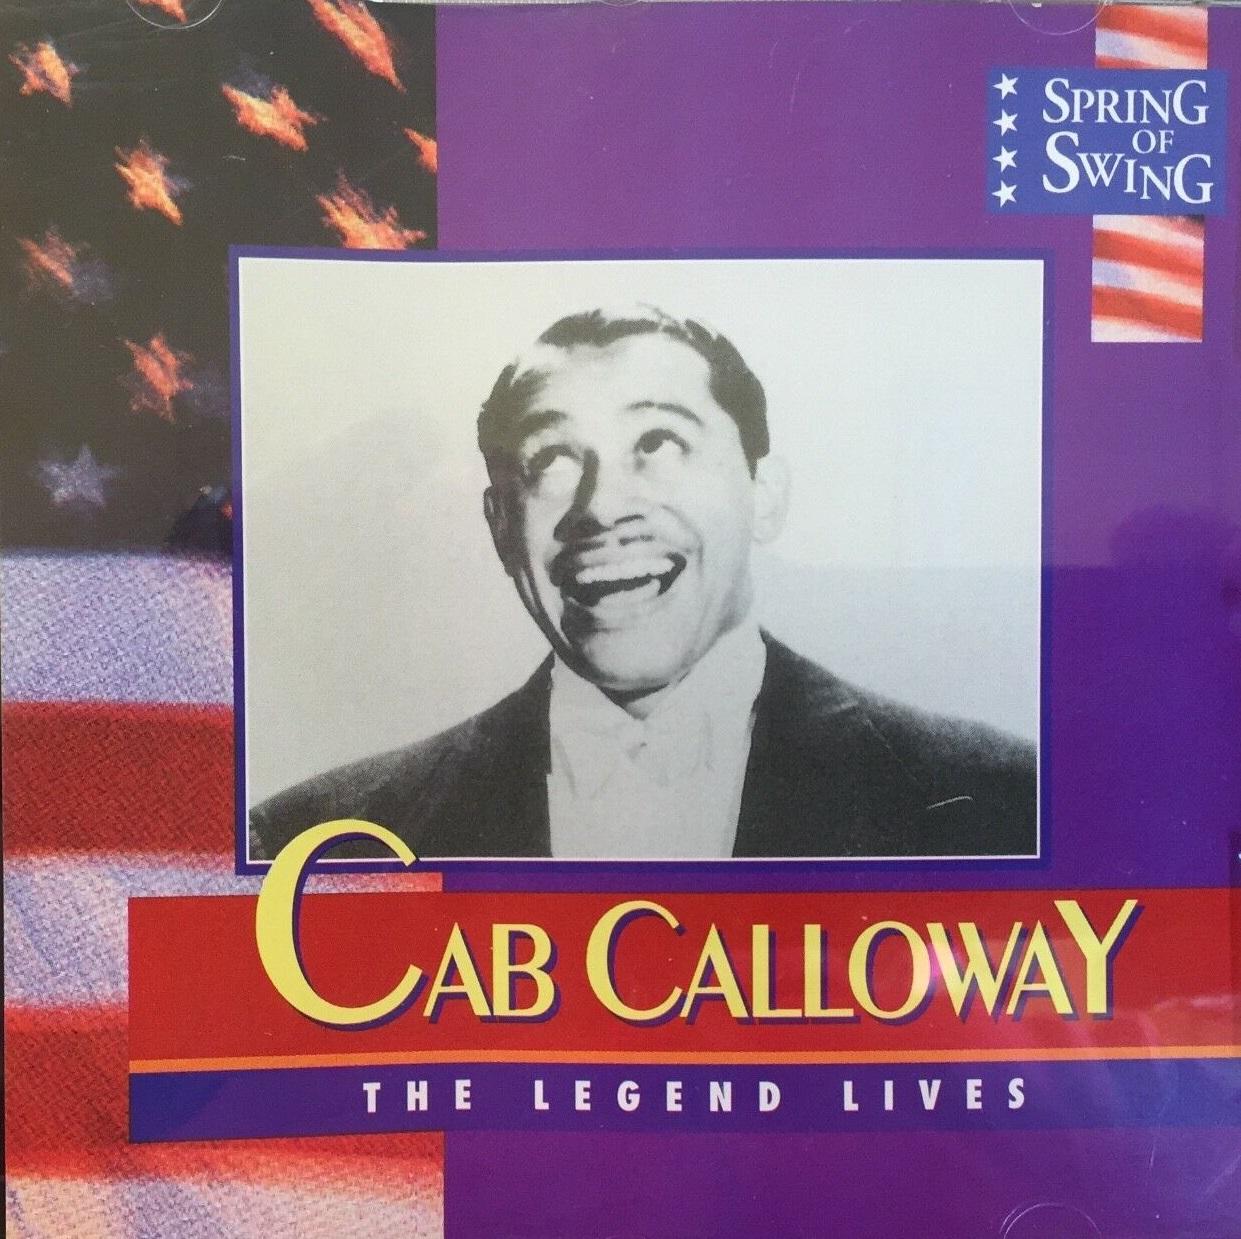 Calloway Cab – Legend Lives